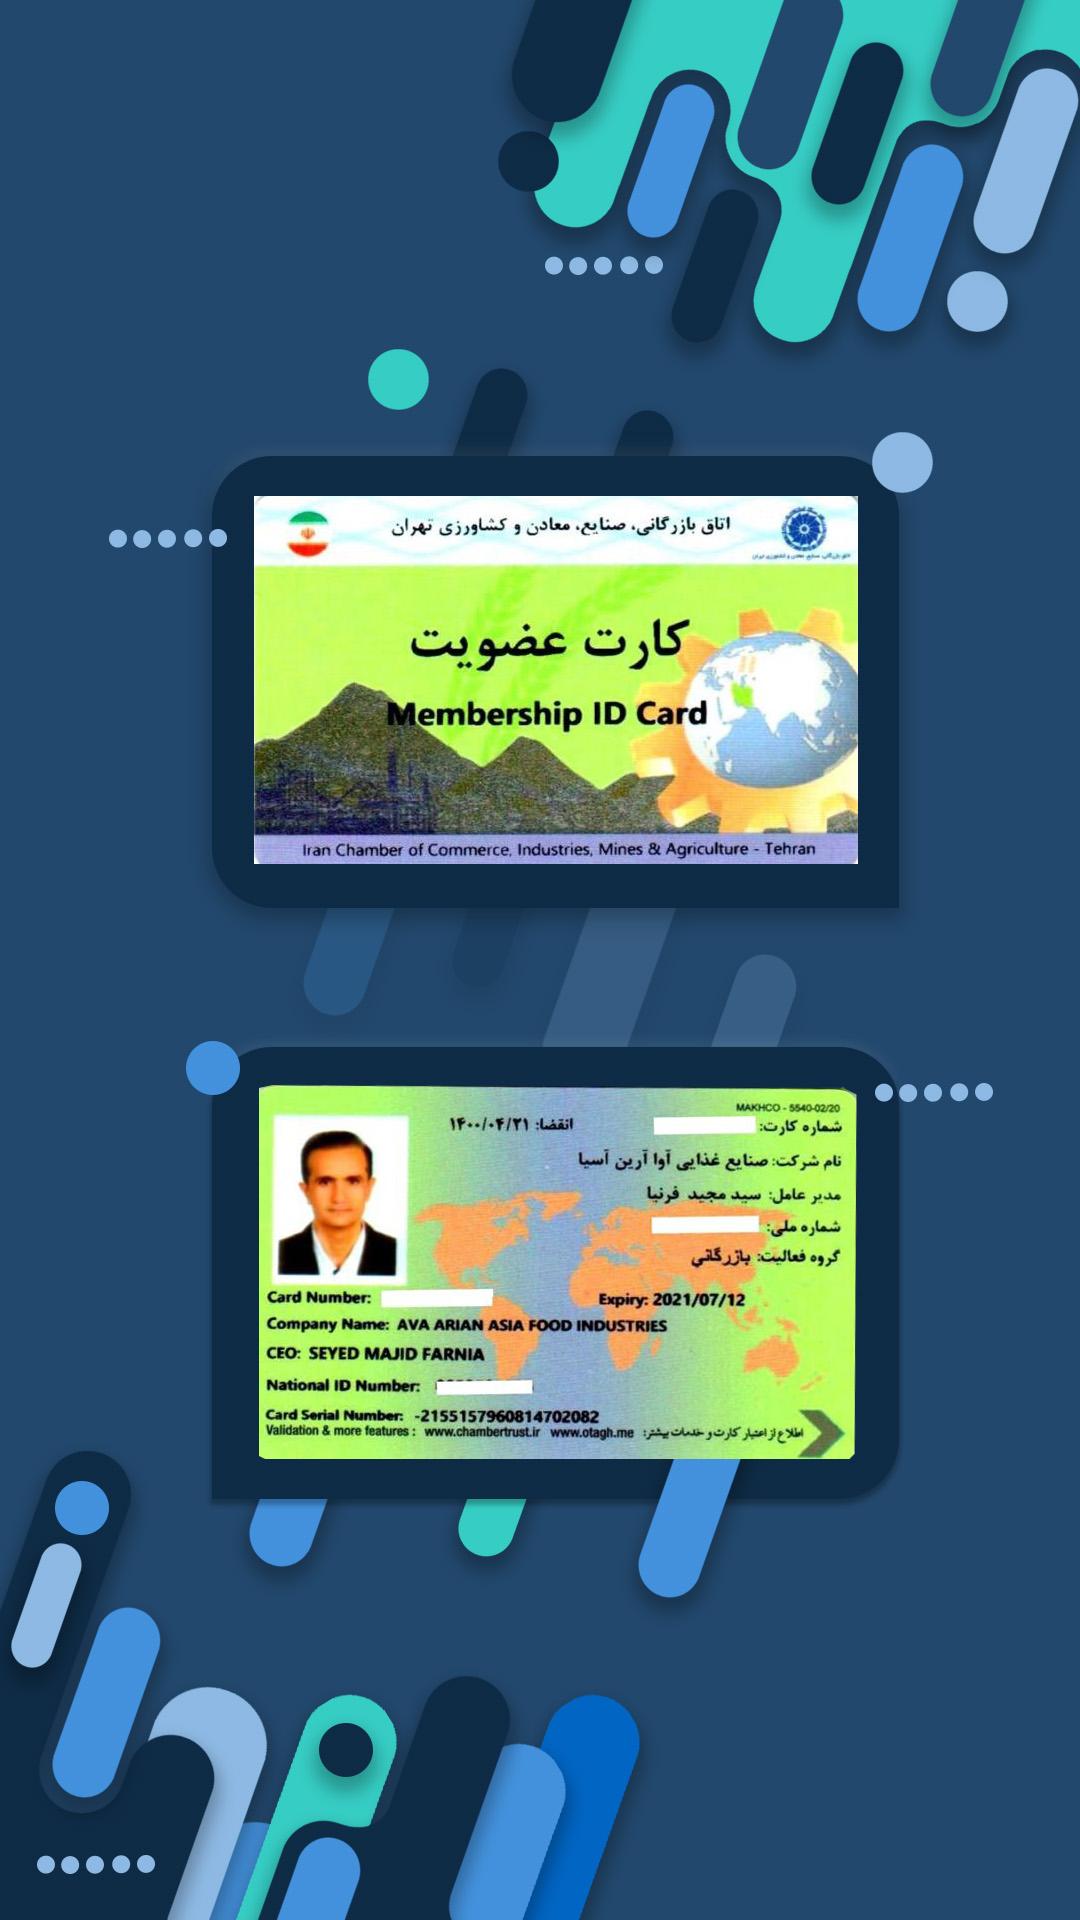 mahan-card-joind-.1-3999